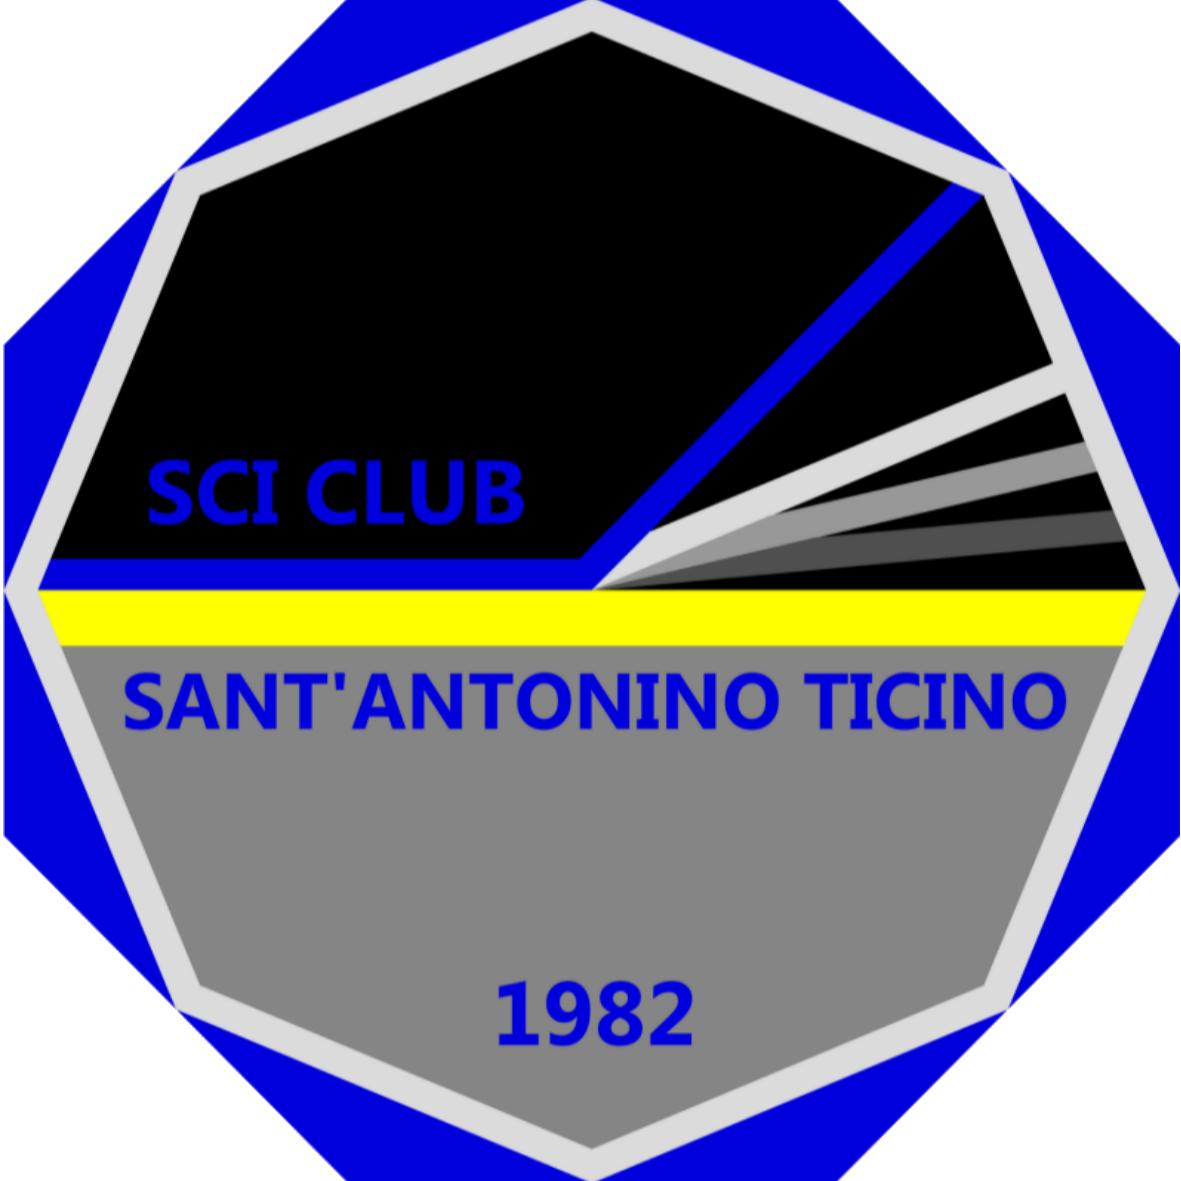 Sci Club S.Antonino Ticino - Logo